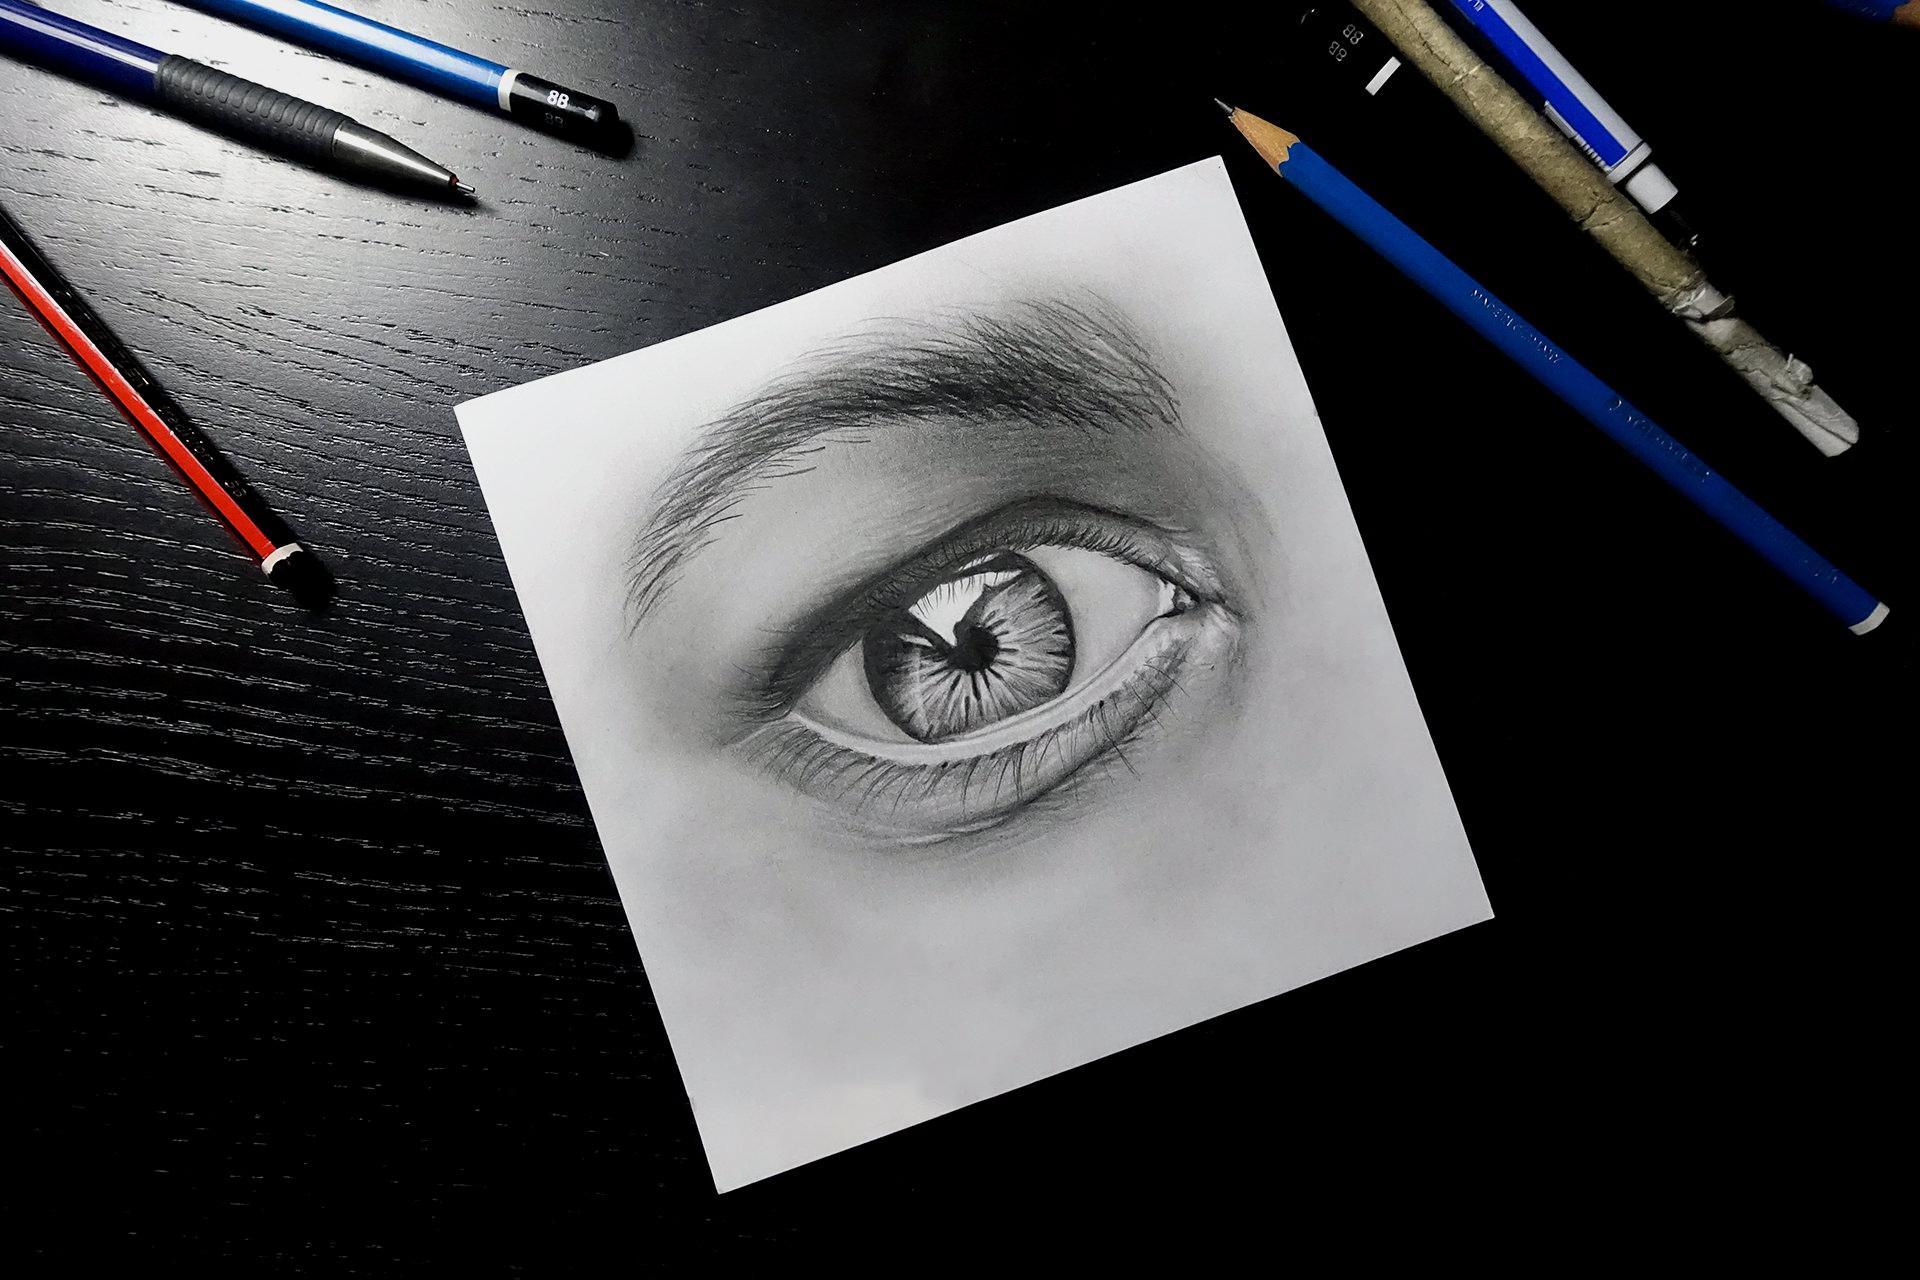 how-to-draw-a-realistic-eye.jpg